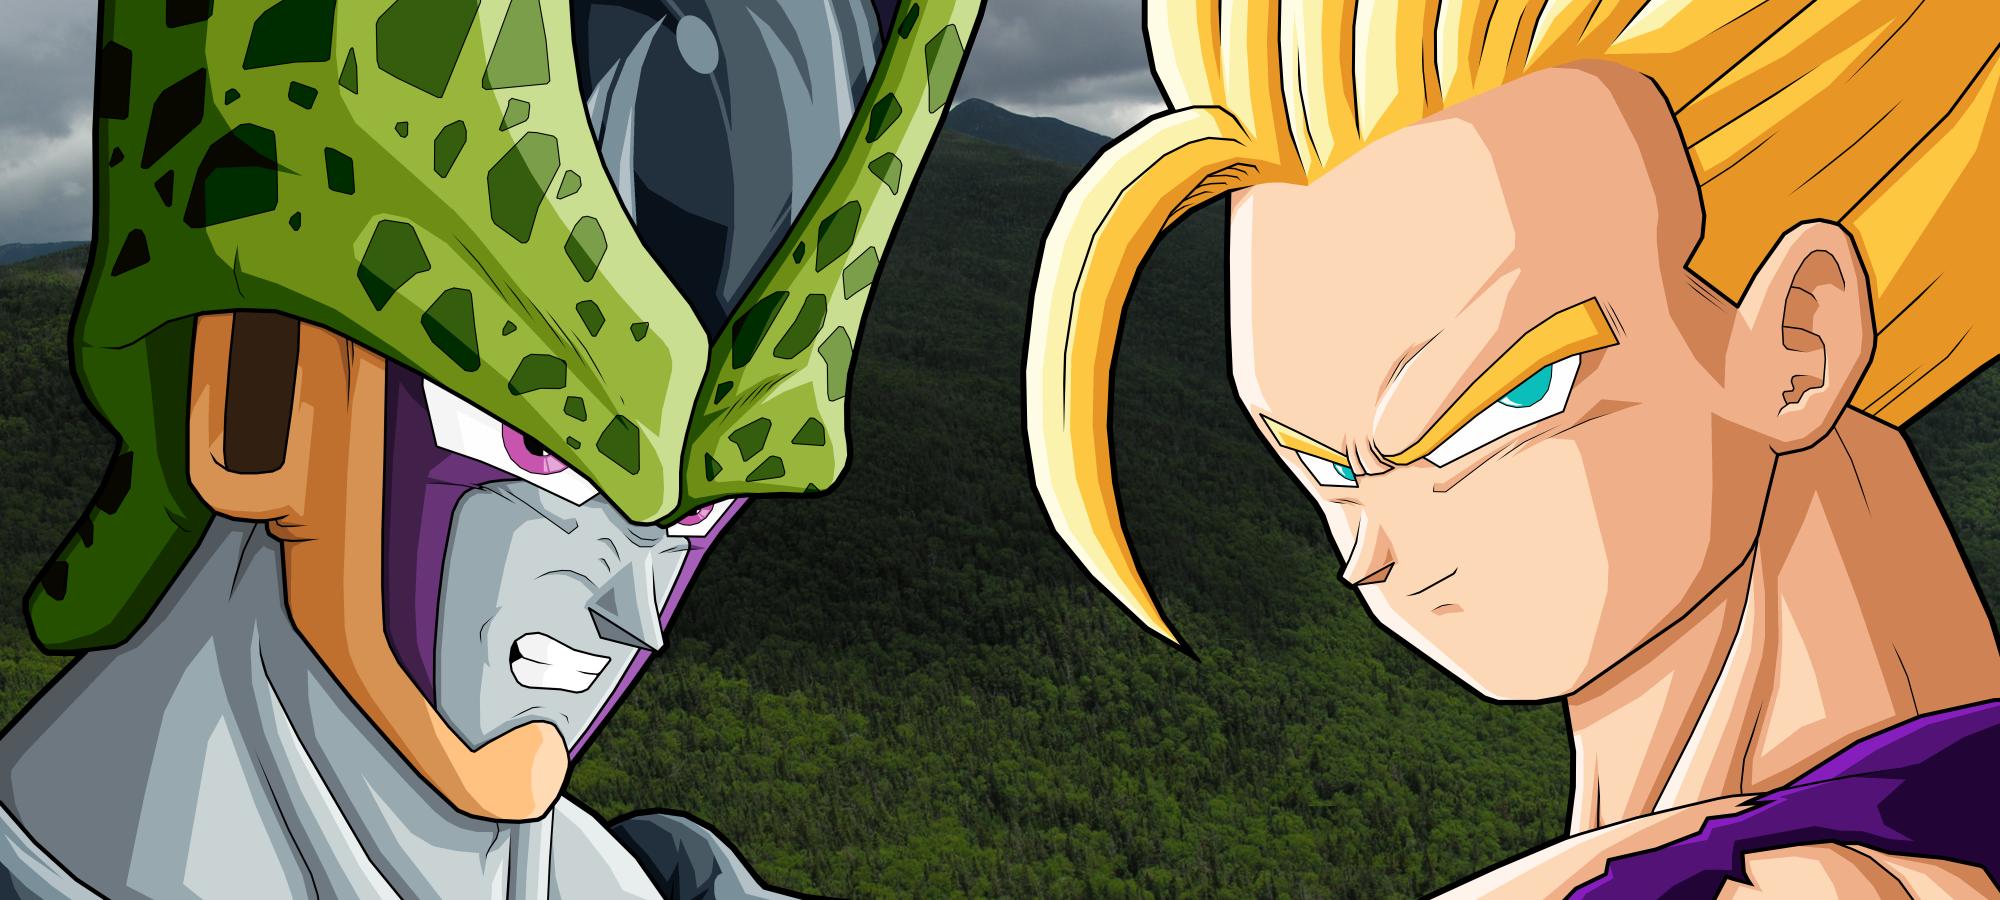 Gohan Vs Cell Megatema Dragon Ball Z Comunidad Of En Taringa